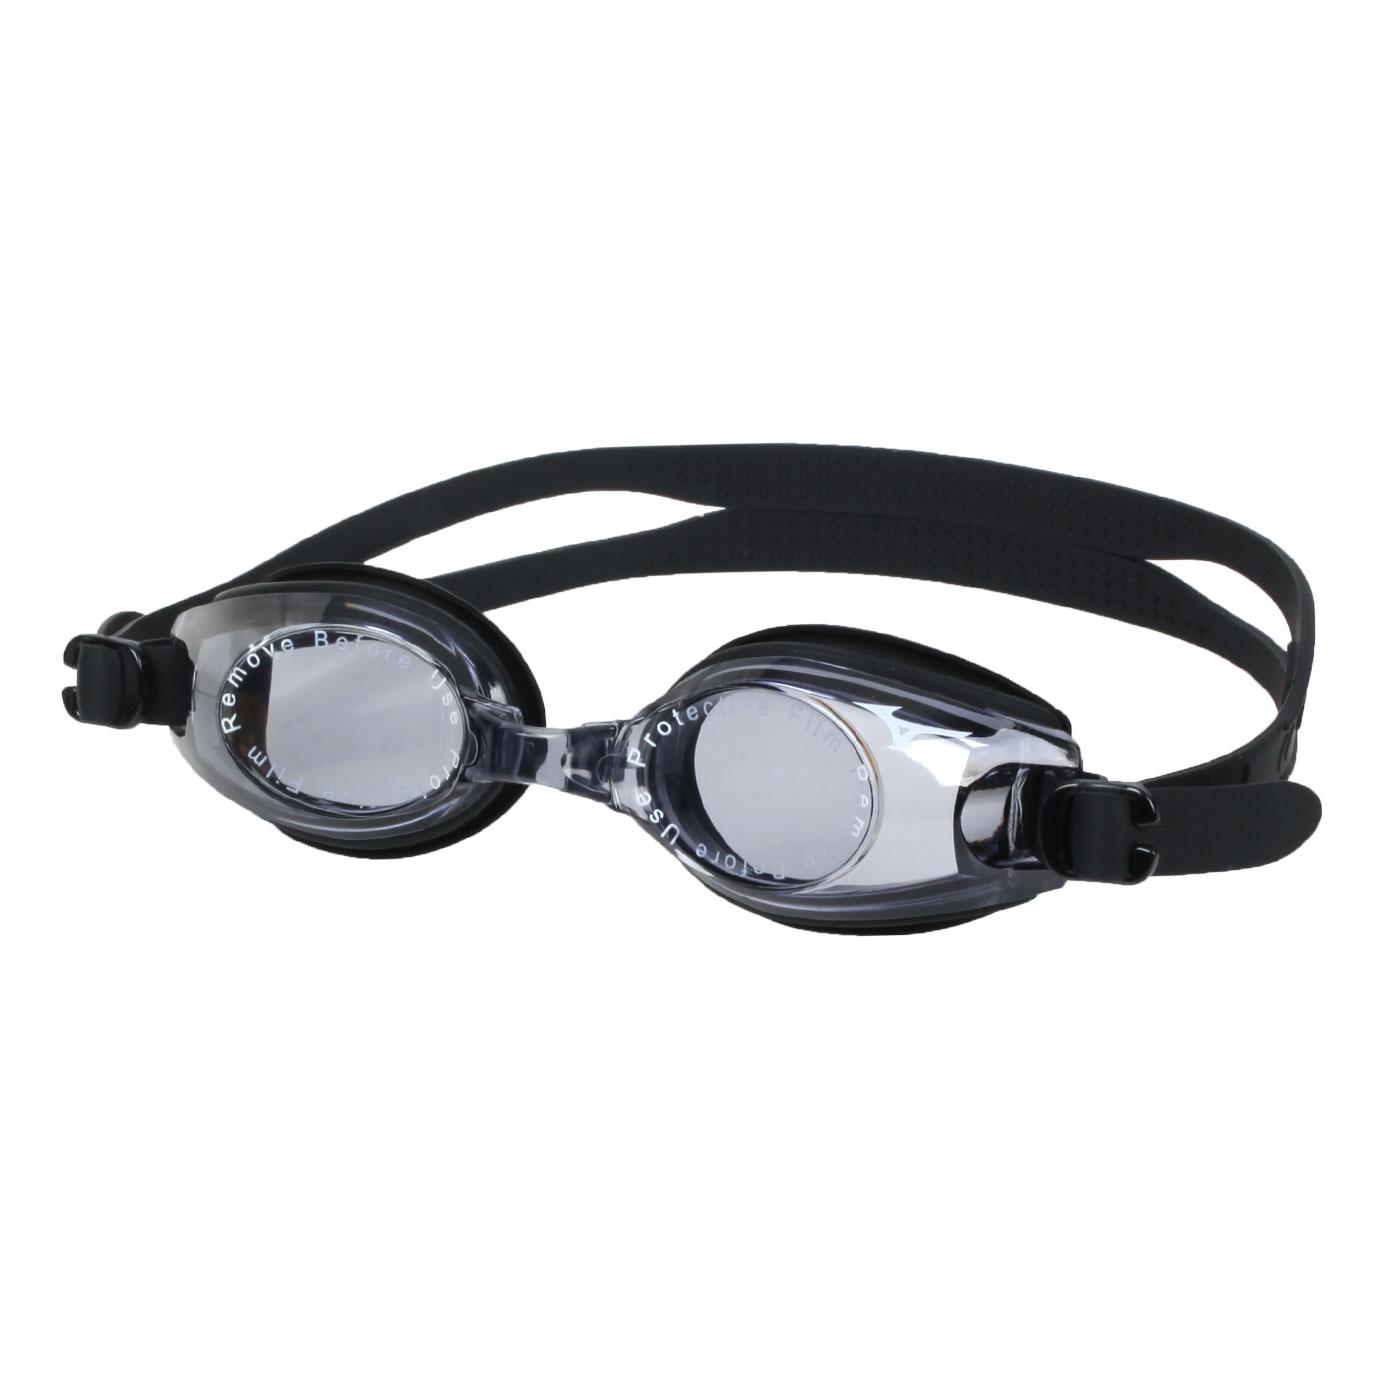 MIZUNO 兒童泳鏡  SWIMN3TF059500-09 - 黑